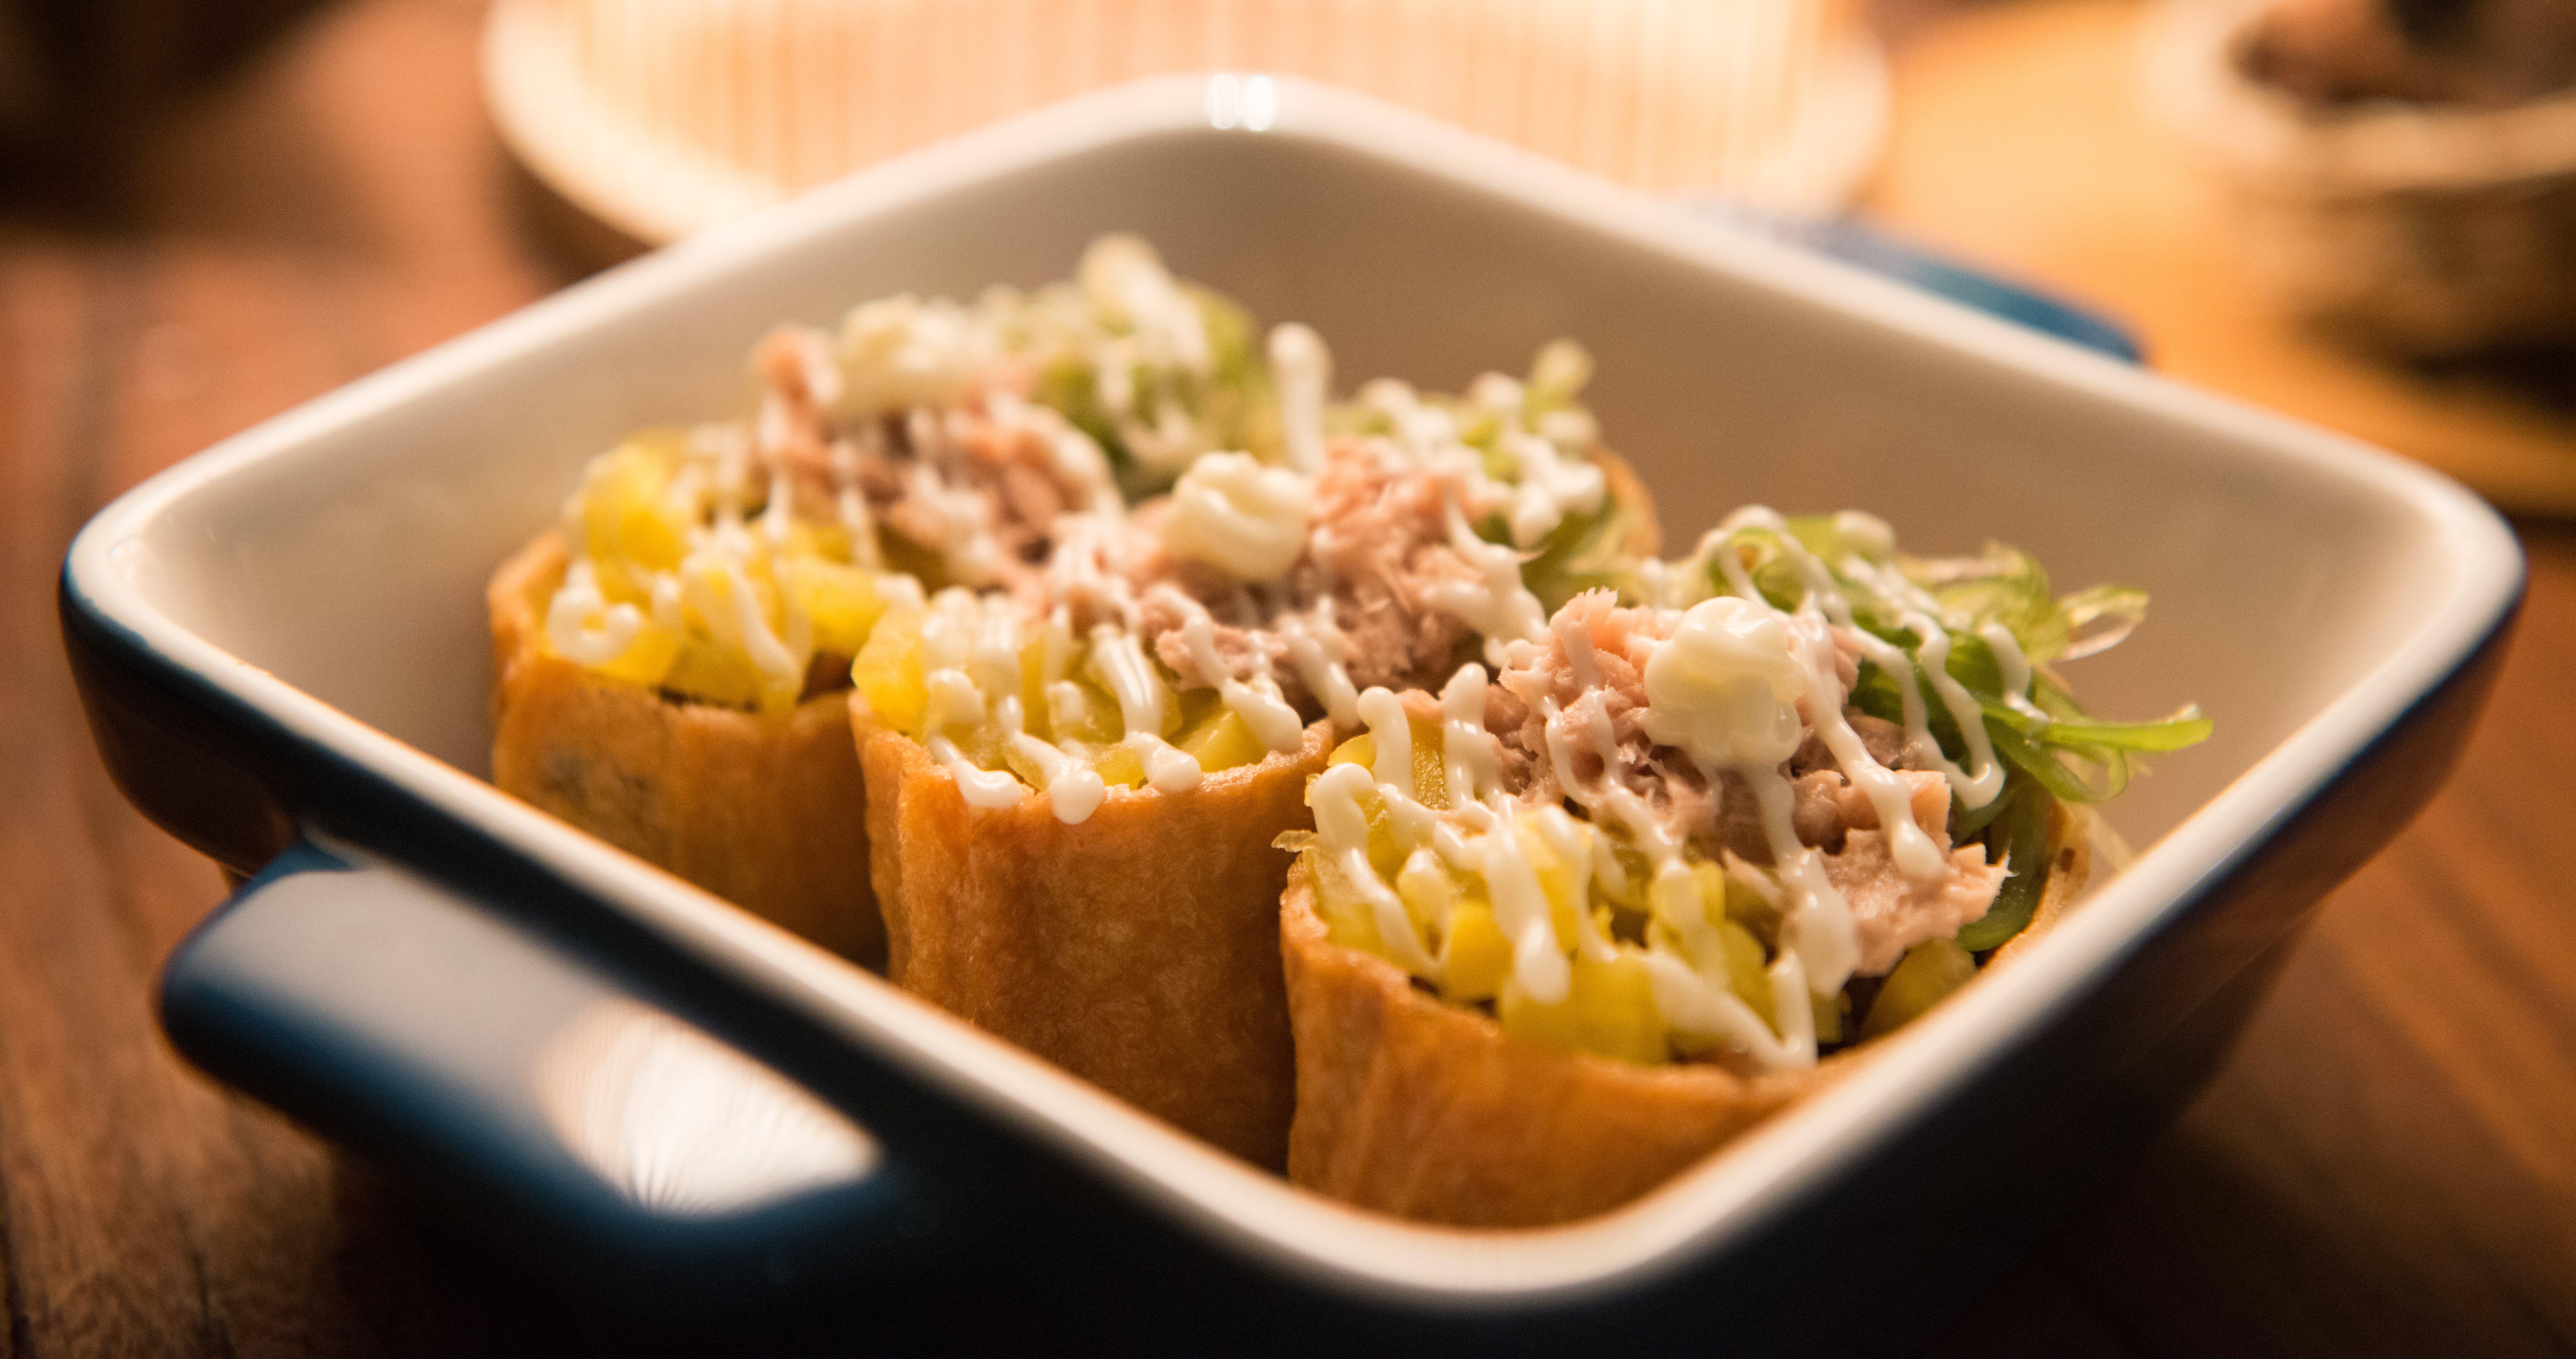 Three Tacos on Black And White Ceramic Bowl